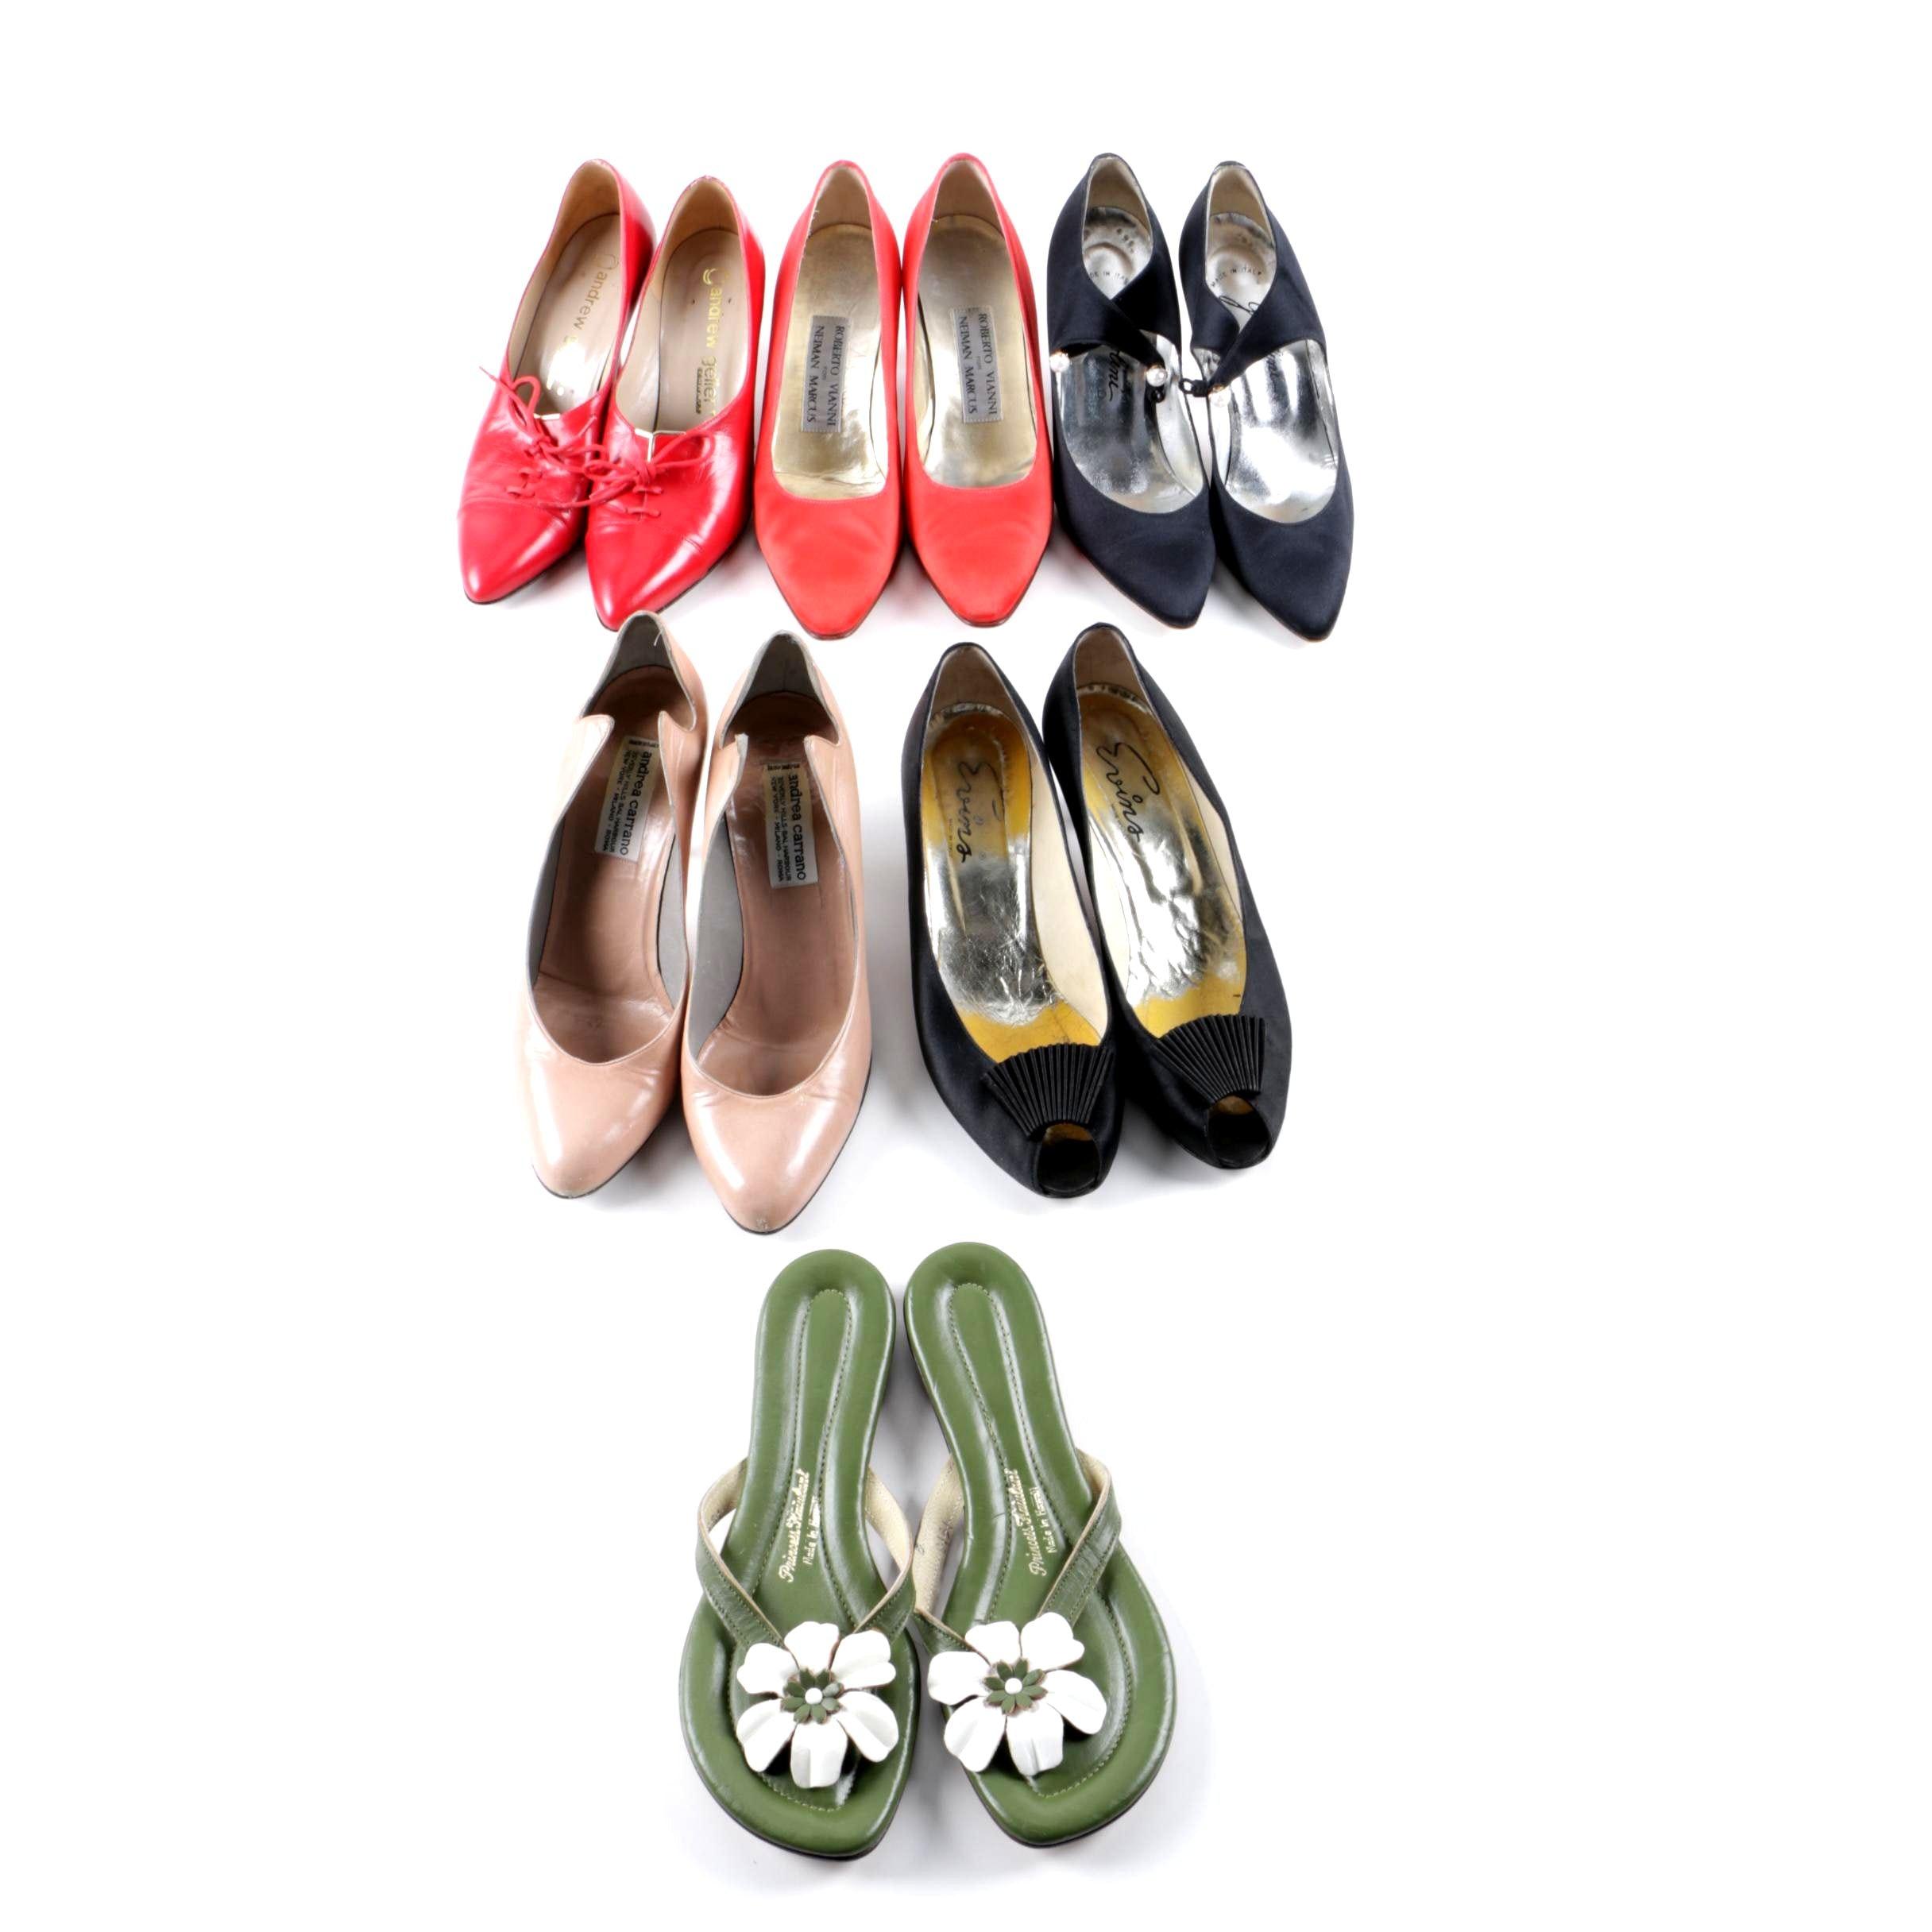 Vintage Heels Including Roberto Vianni, Andrea Carrano and Andrew Geller